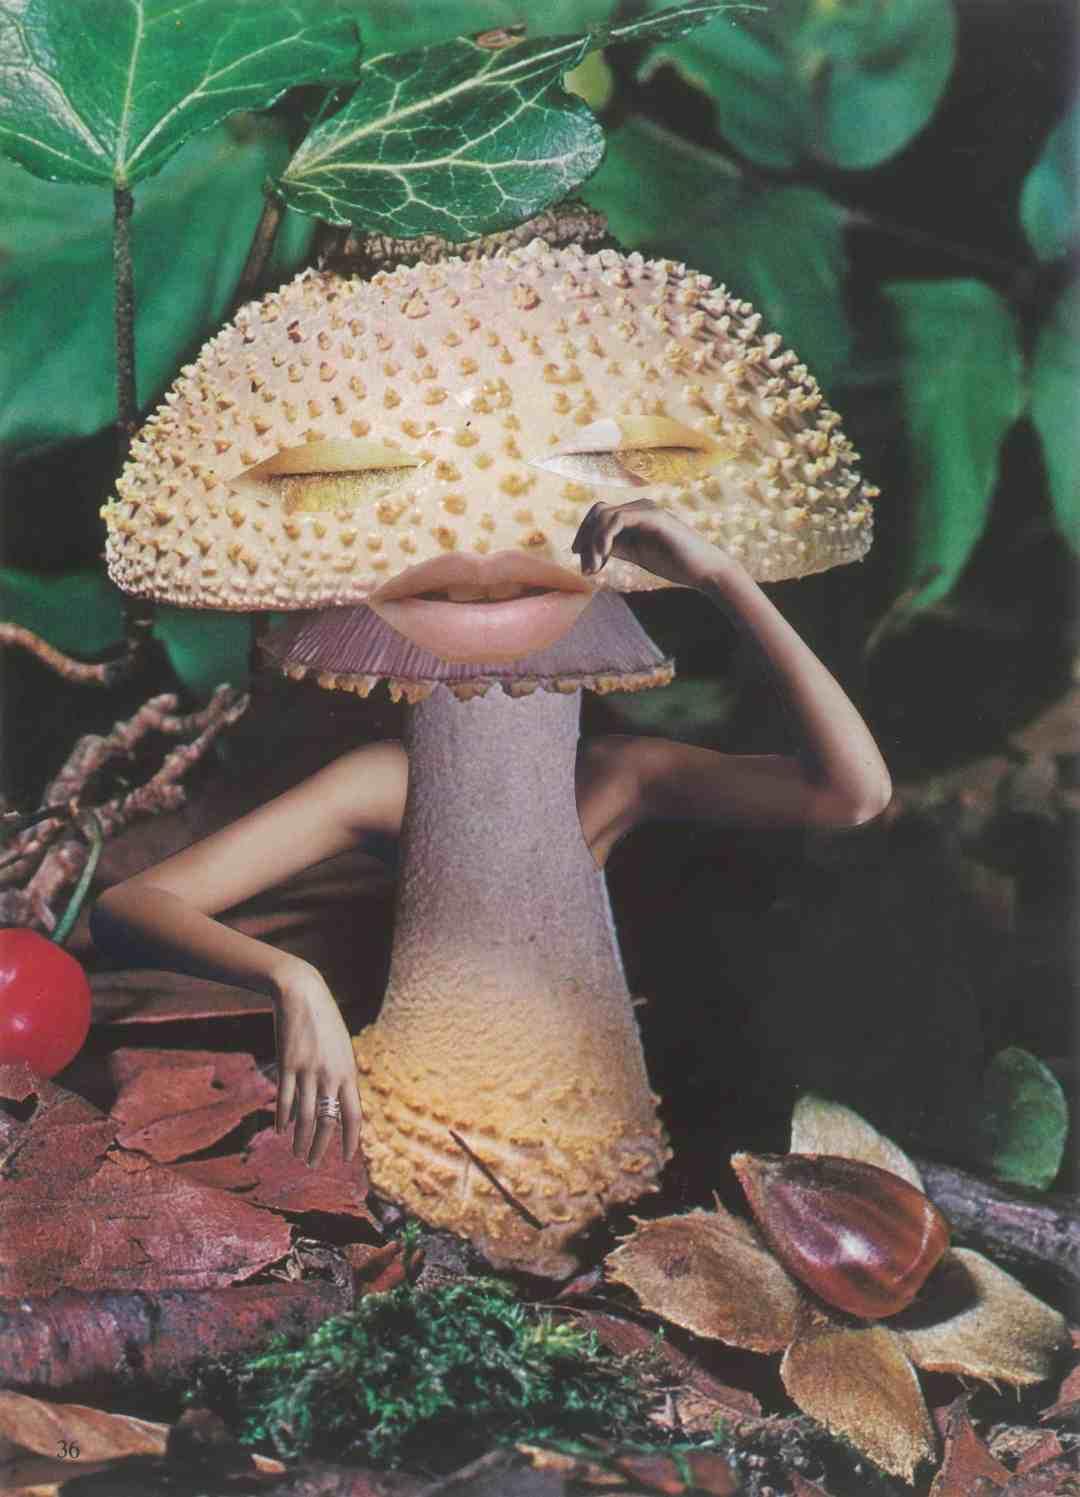 Seana Gavin, 'Mindful Mushroom', courtesy of the artist